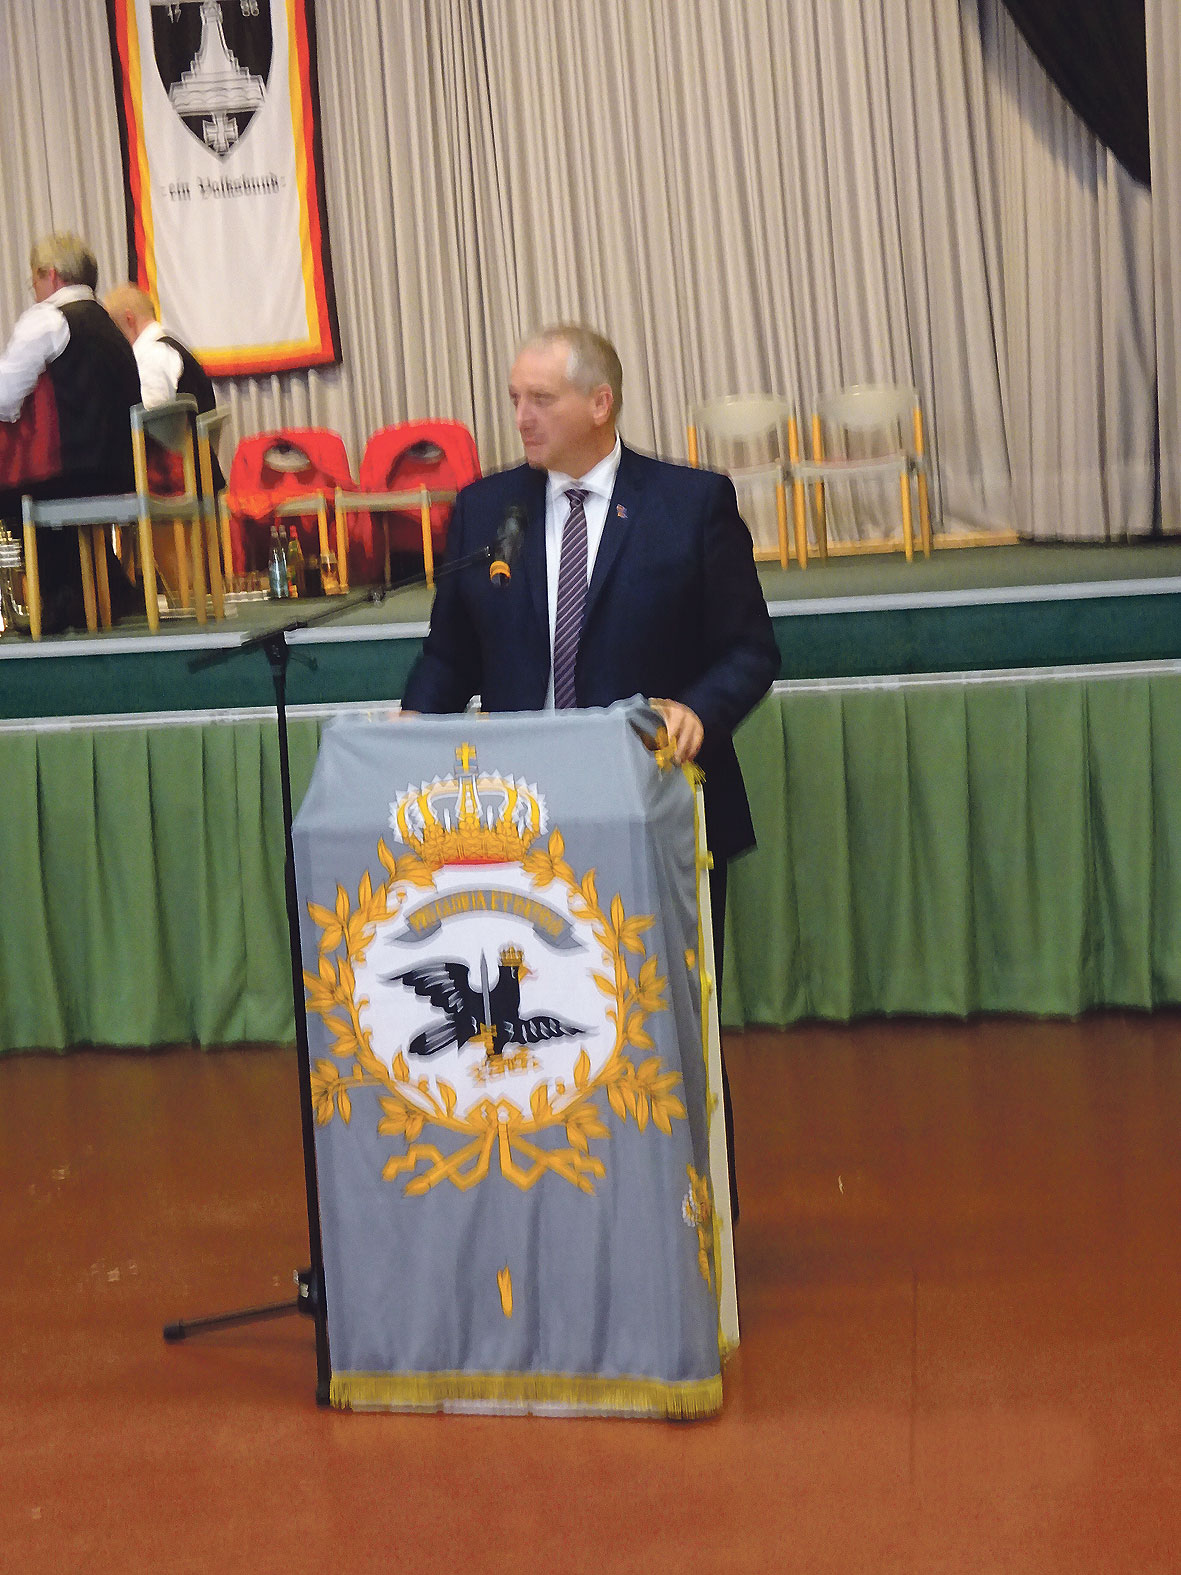 Festredner Vize Landtagspräsident Niedersachsen Frank Oesterhelweg.